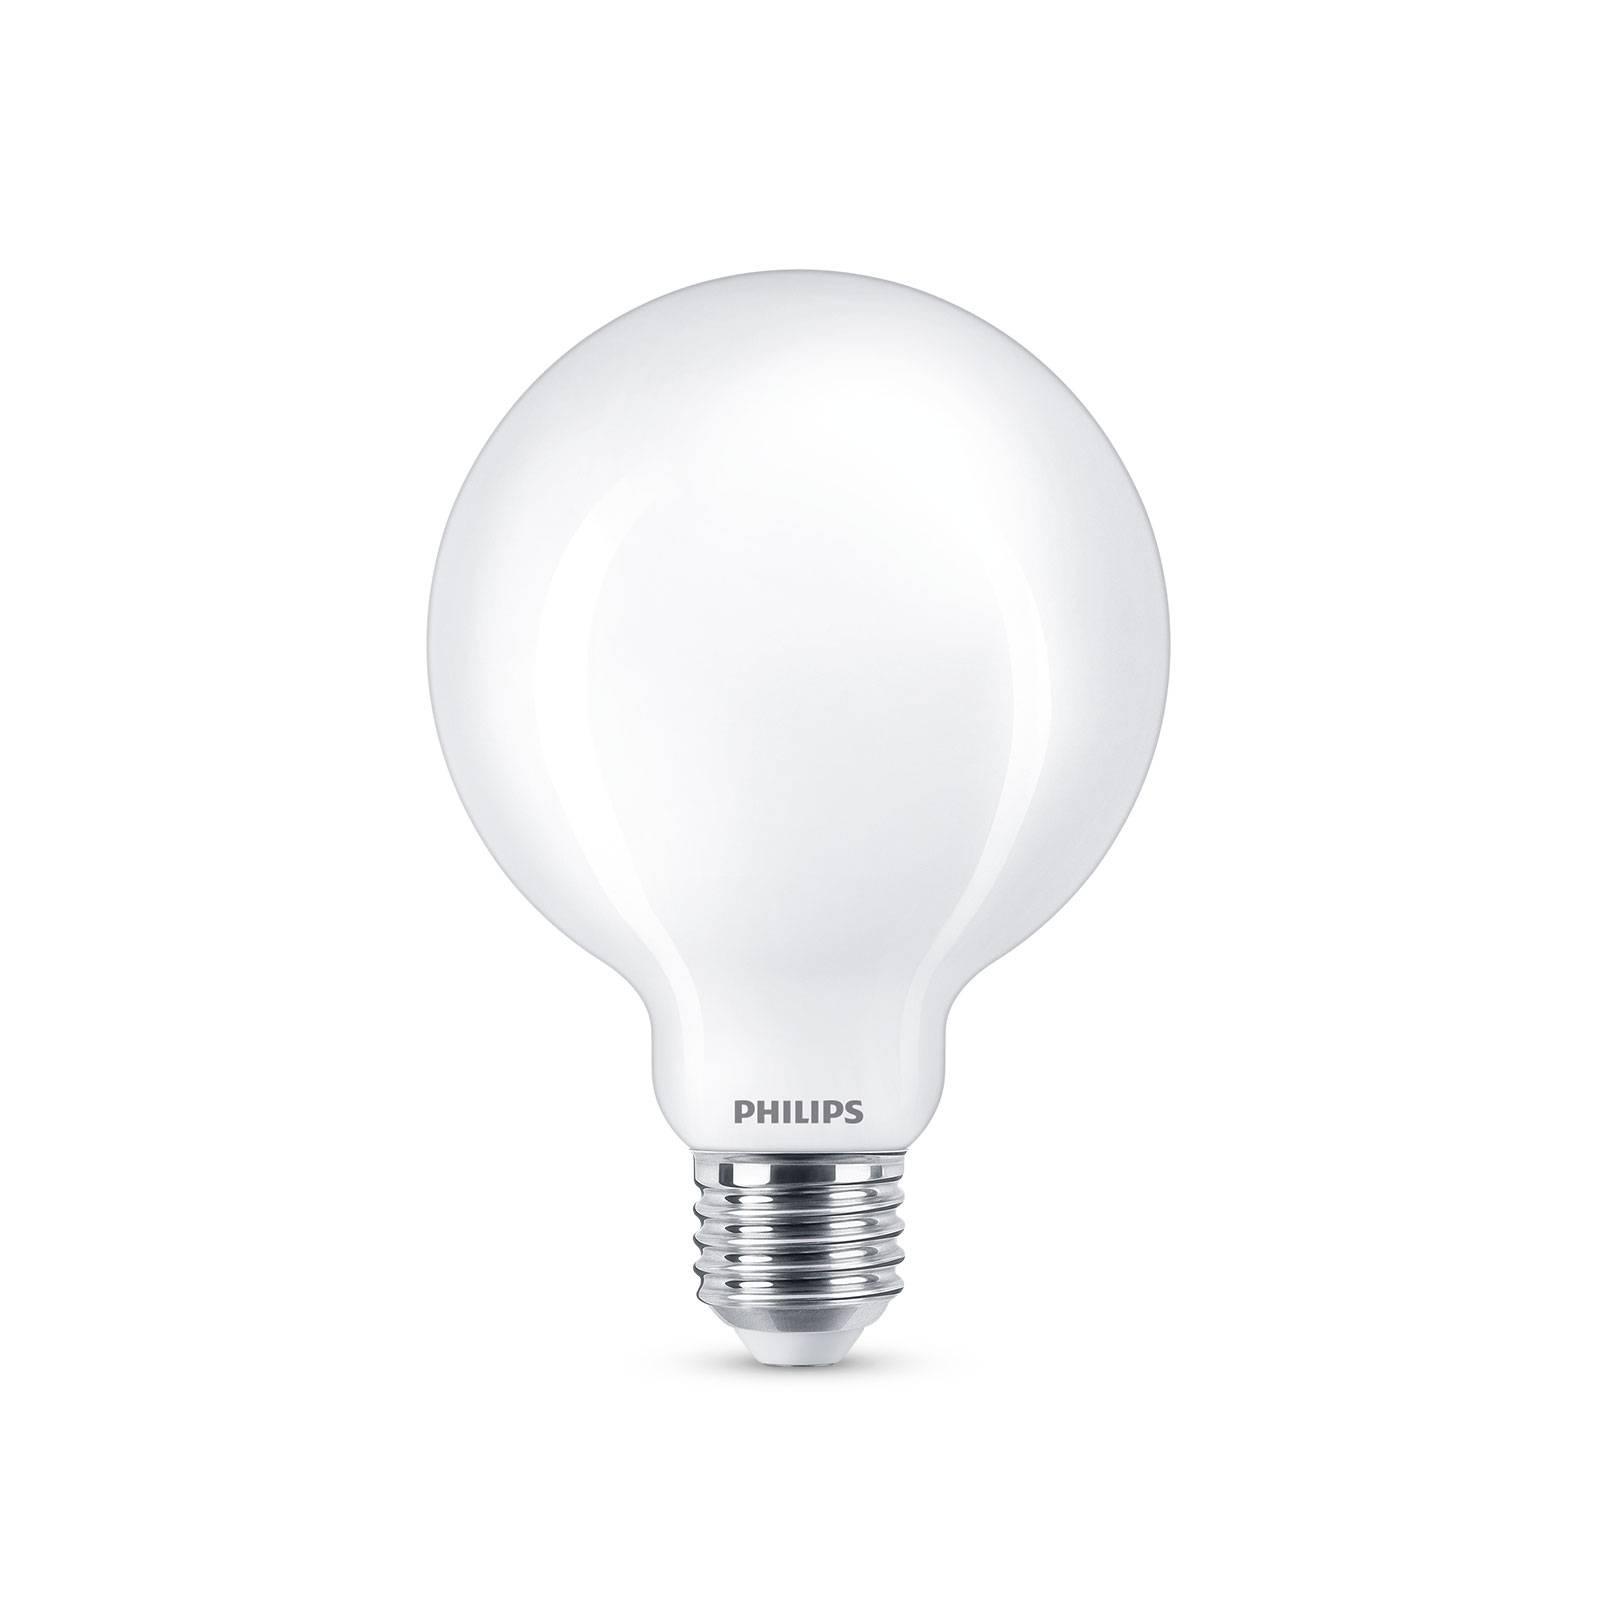 Philips LED-globe-lamppu E27 G93 7 W, 2 700 K